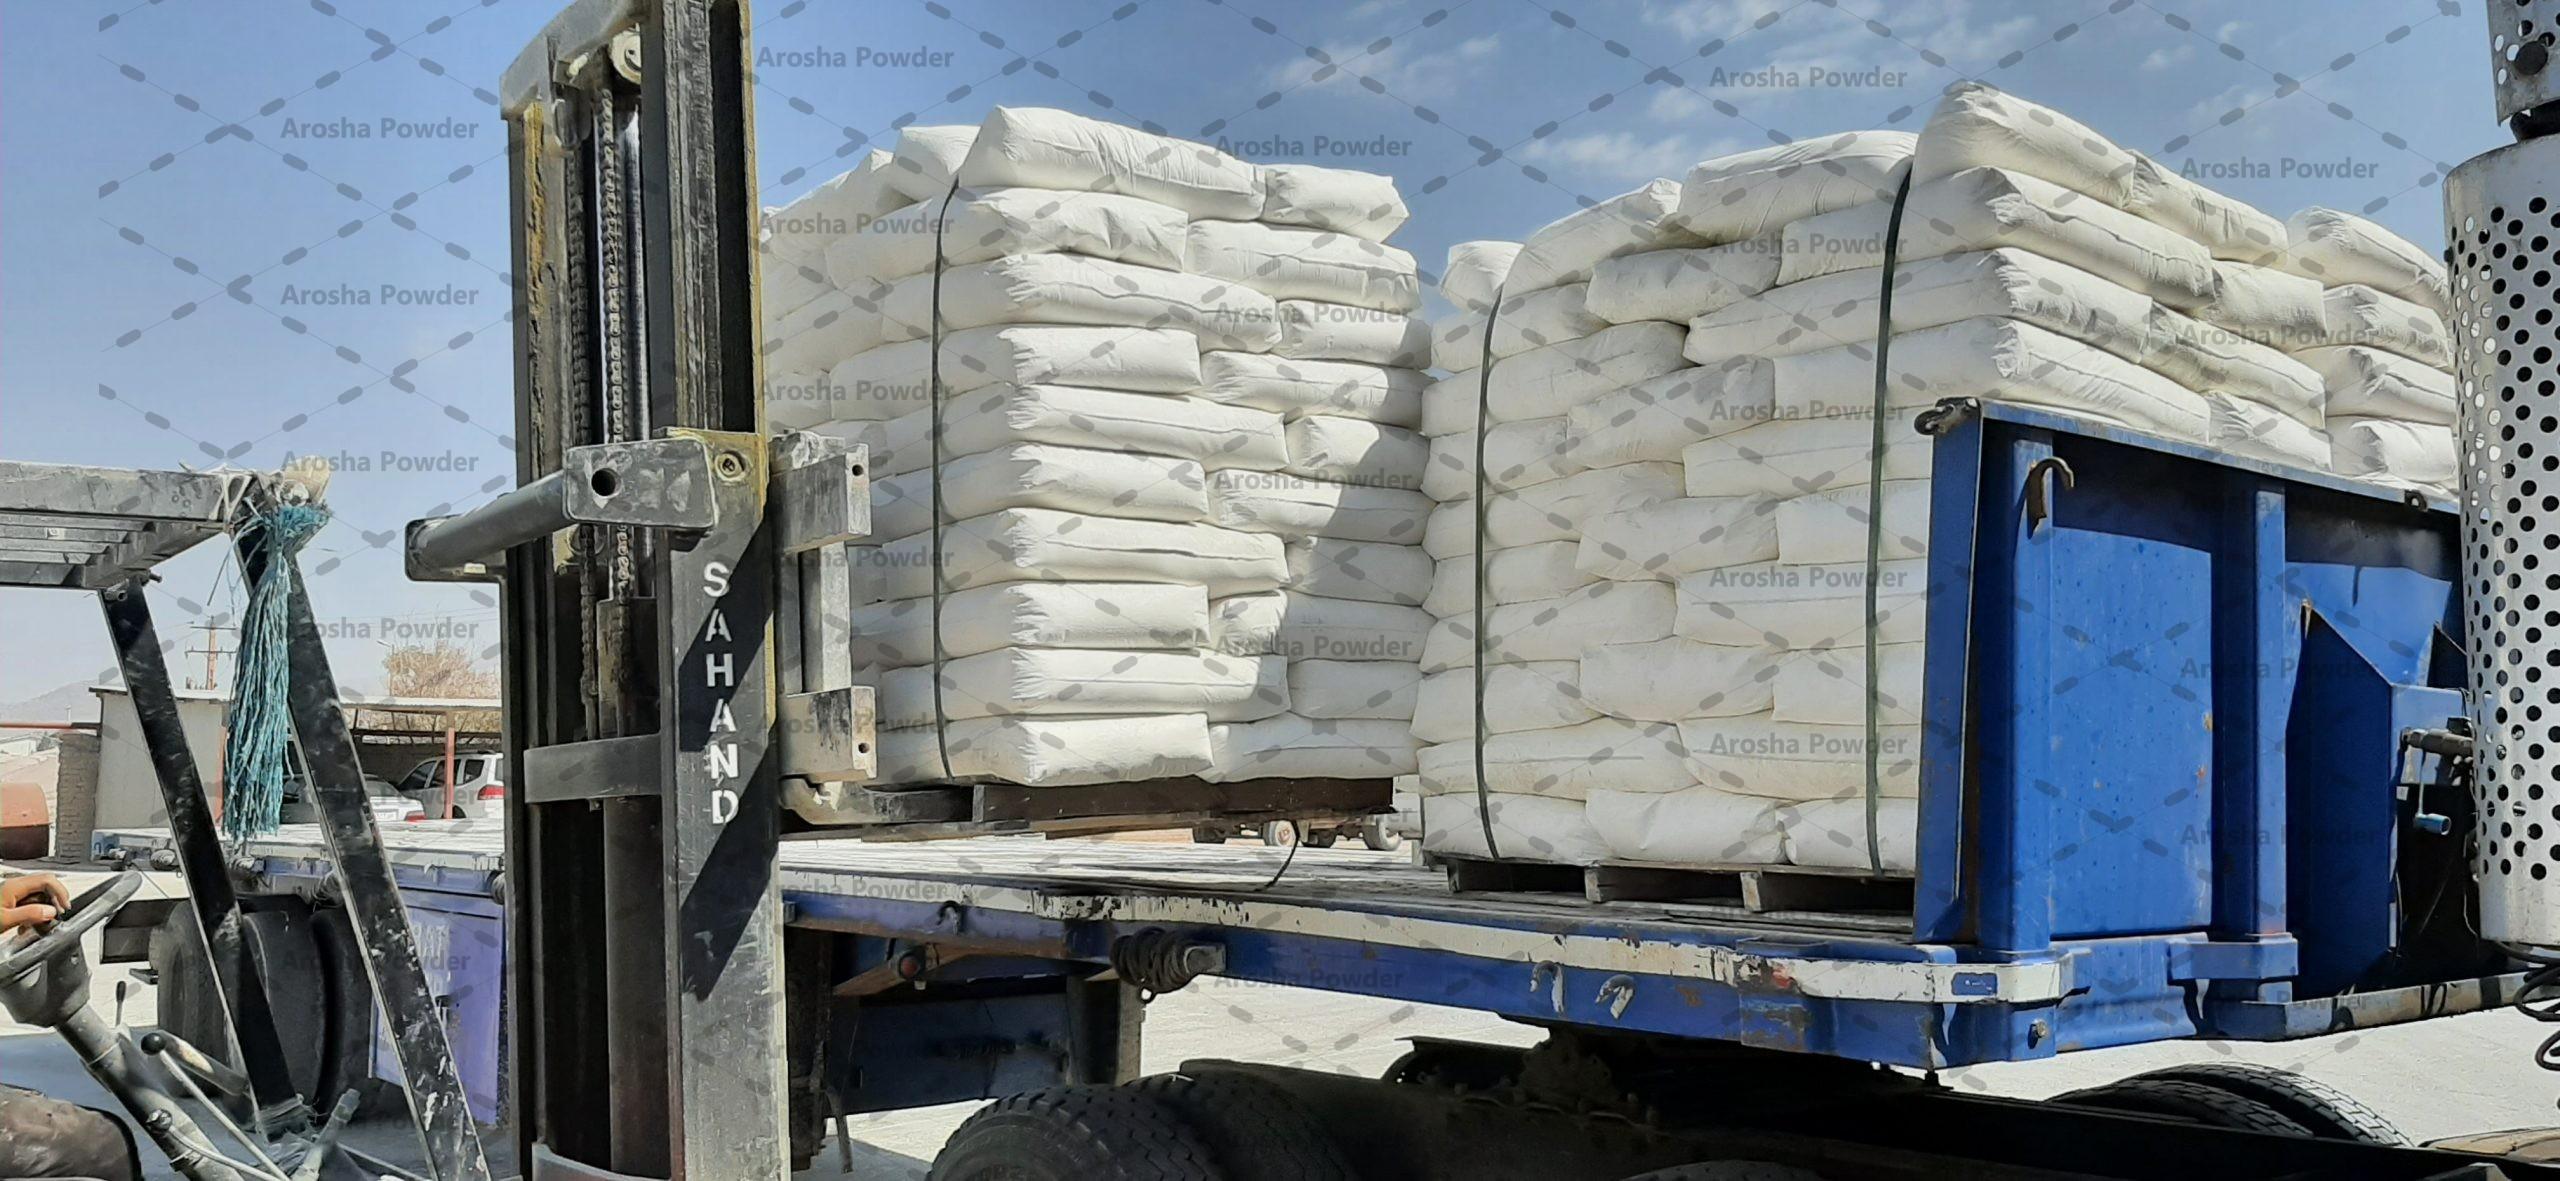 عمده فروشی پودر کربنات کلسیم پوشش دار